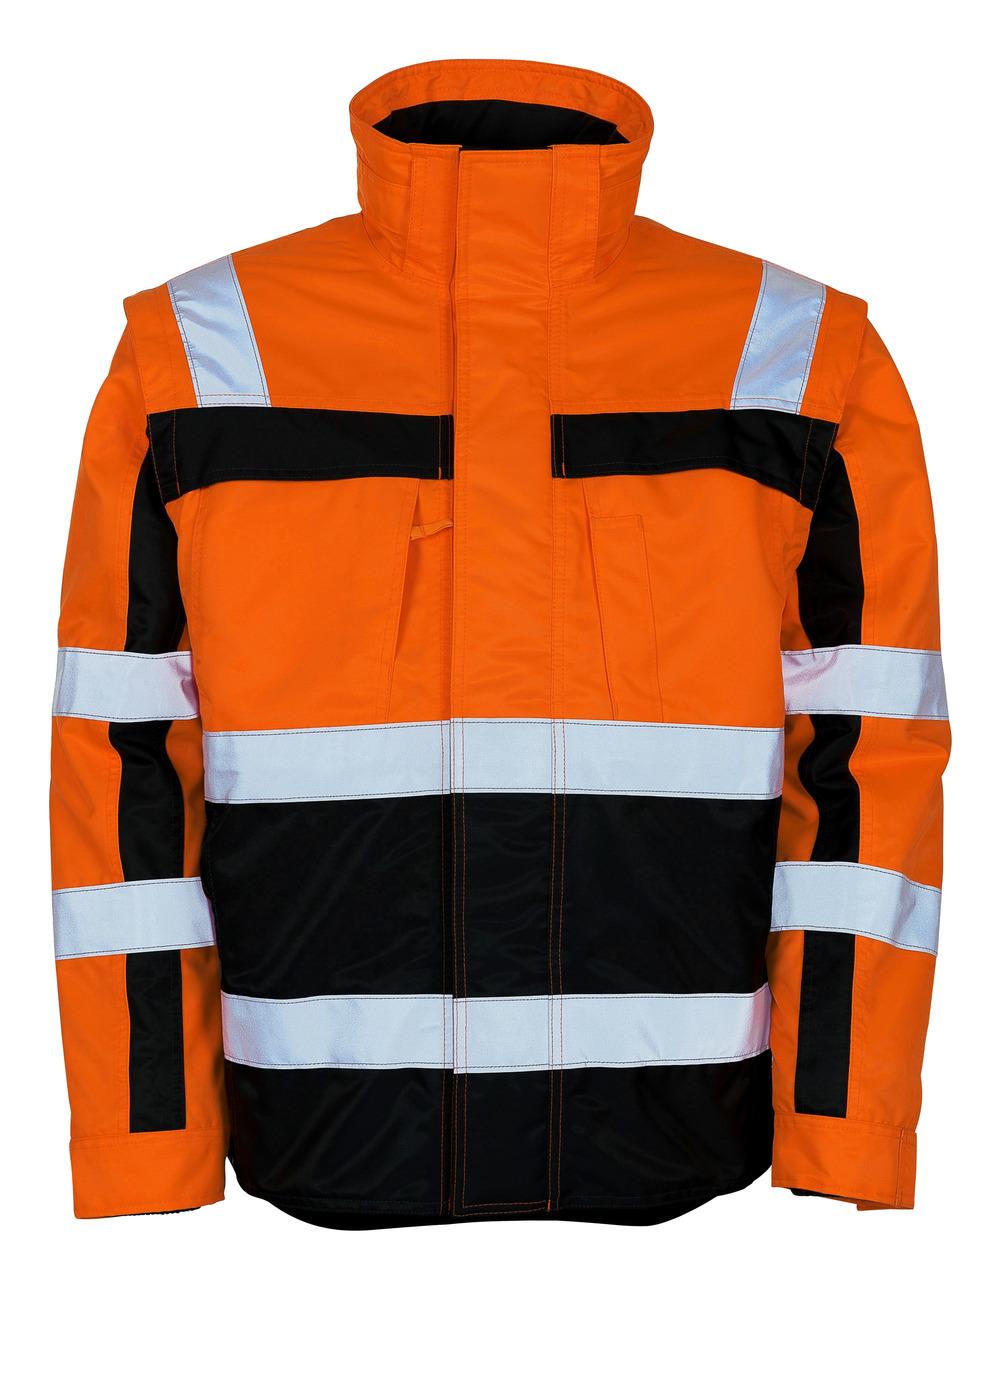 09335-880-141 Winterjacke - hi-vis Orange/Marine